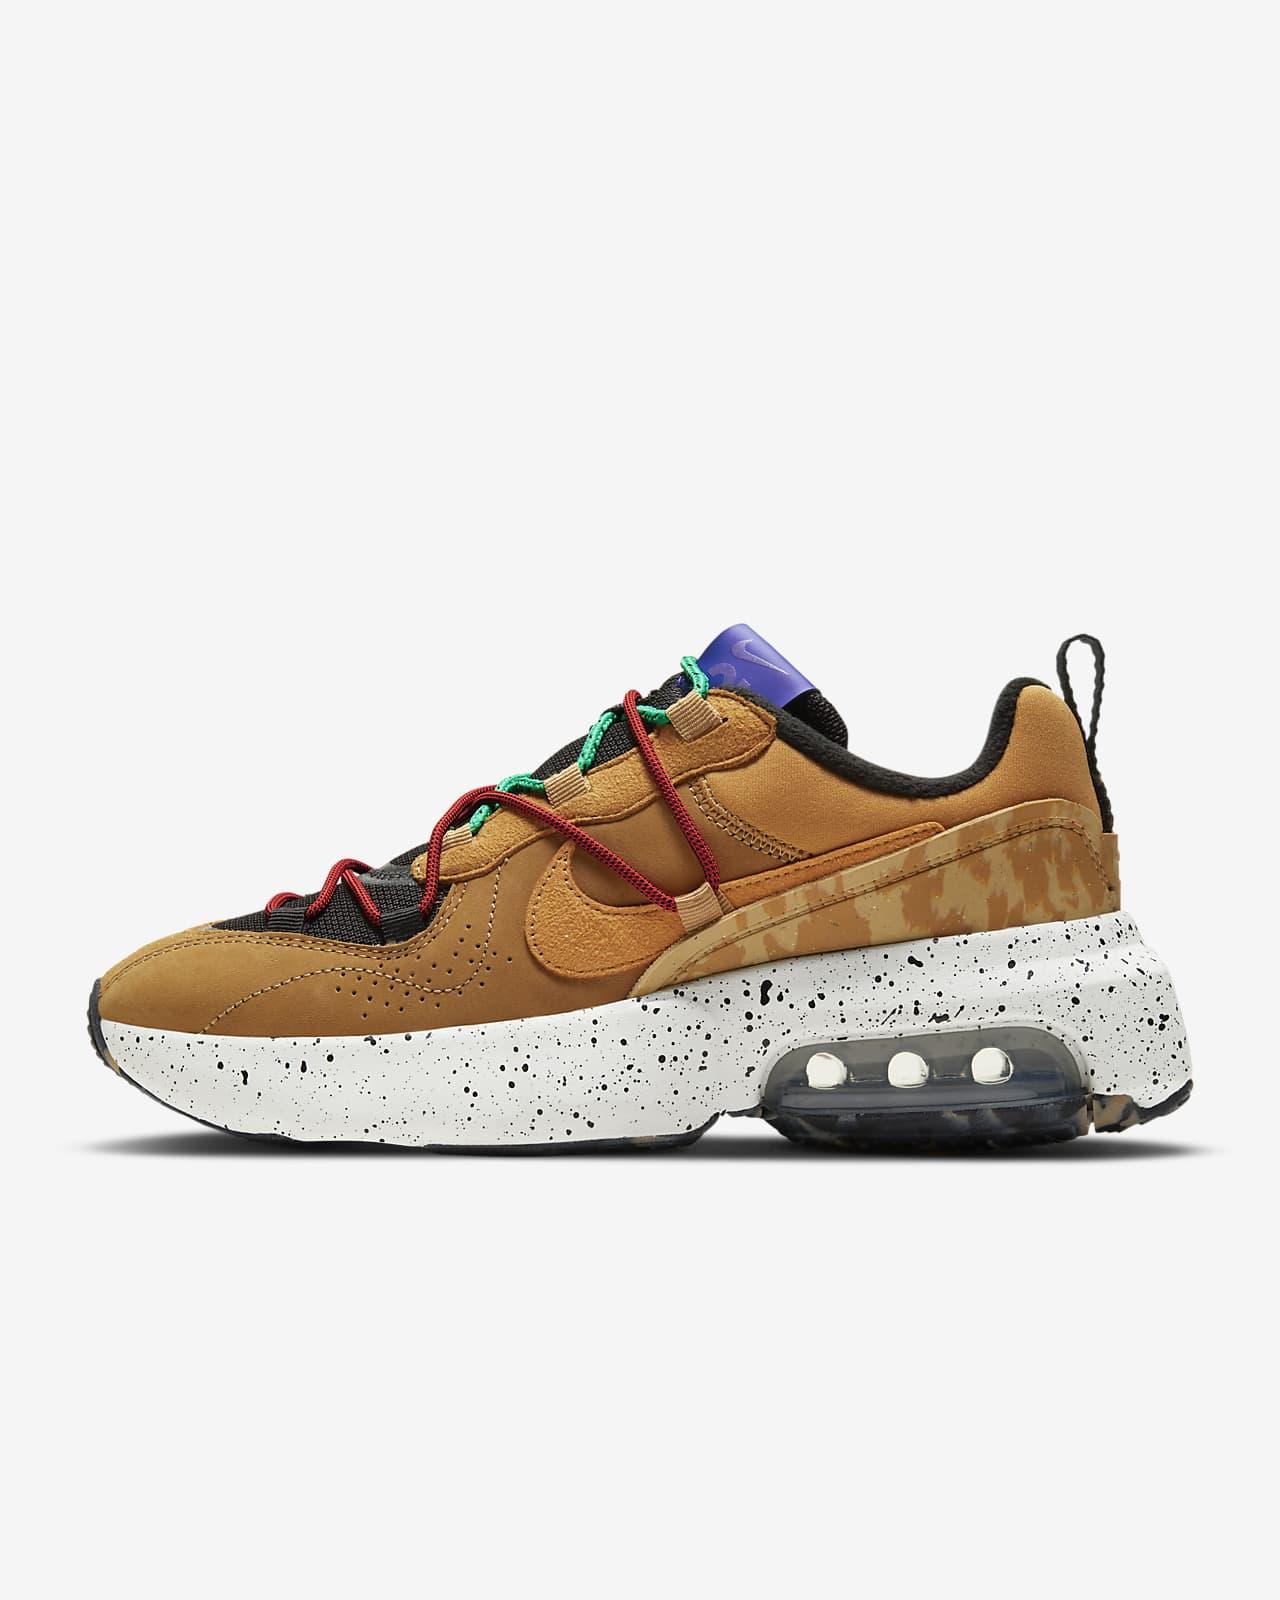 Chaussure Nike Air Max Viva pour Femme